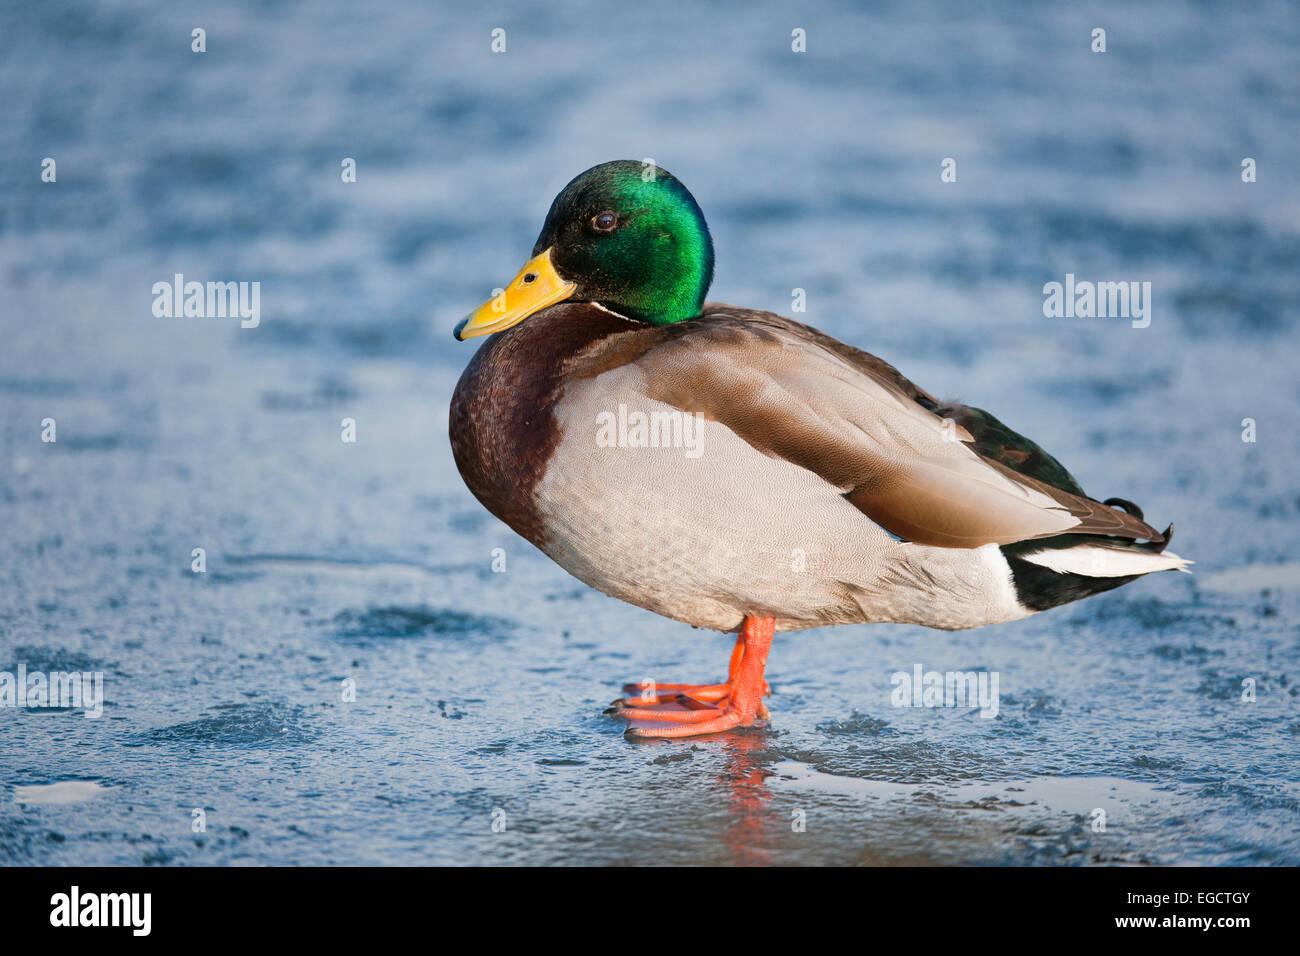 Mallard (Anas platyrhynchos), drake, standing on a frozen pond, Thuringia, Germany - Stock Image